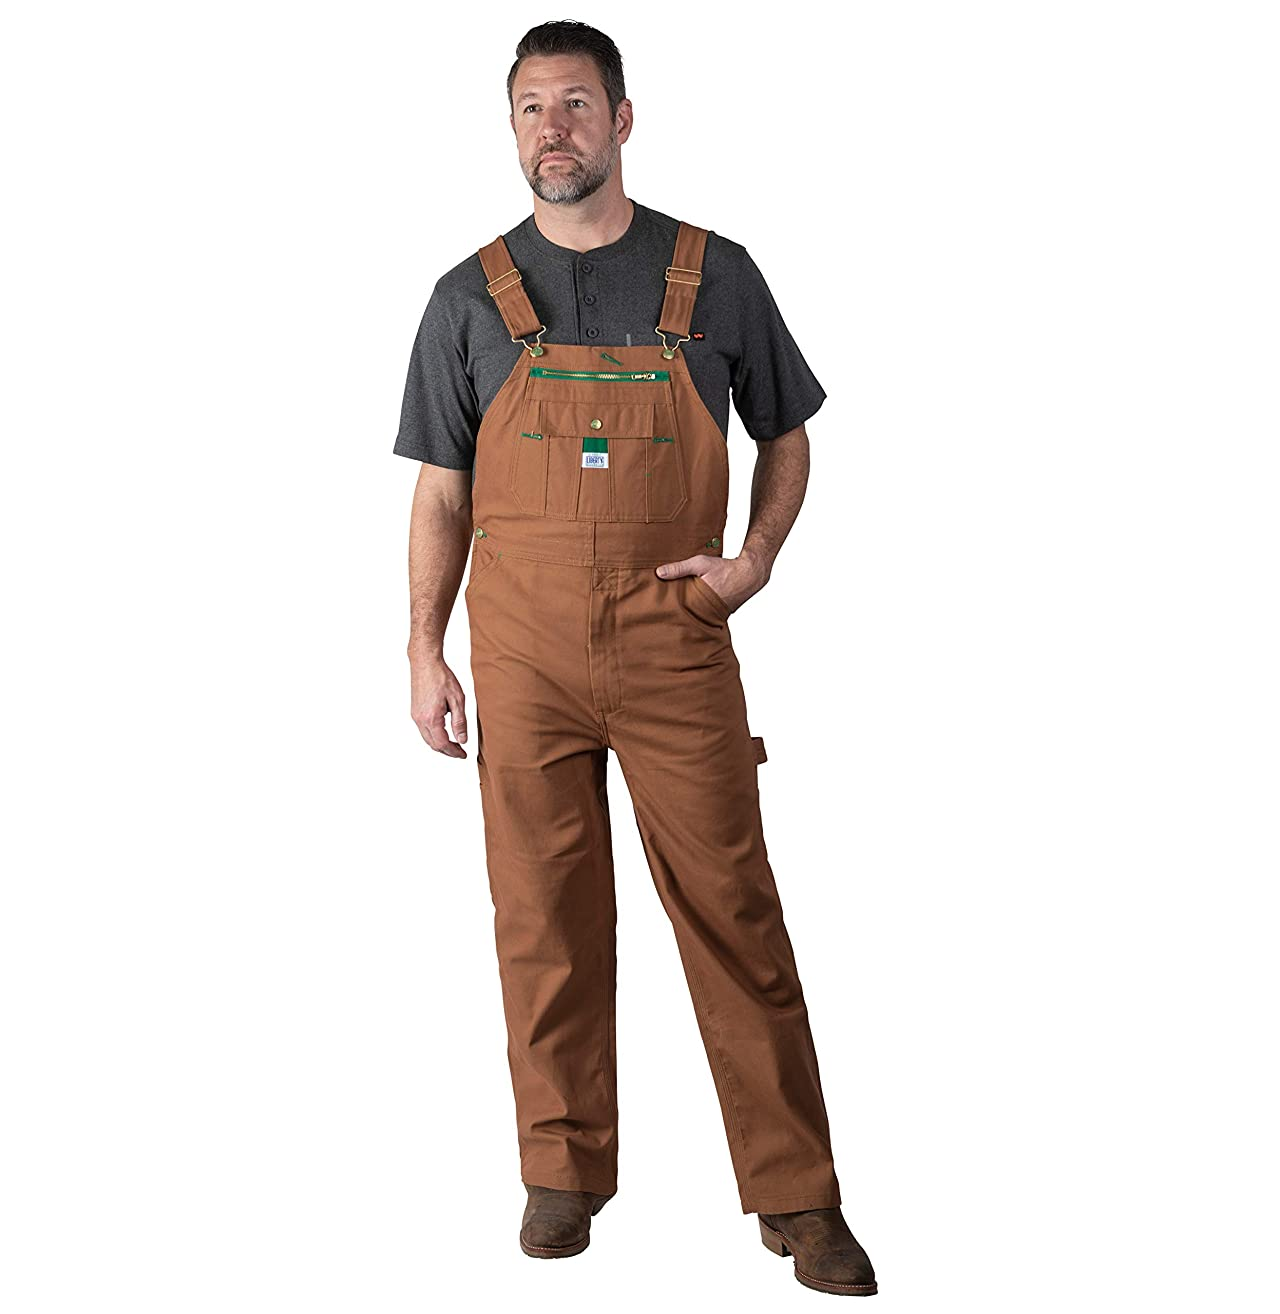 Liberty Men's Duck Bib Overall